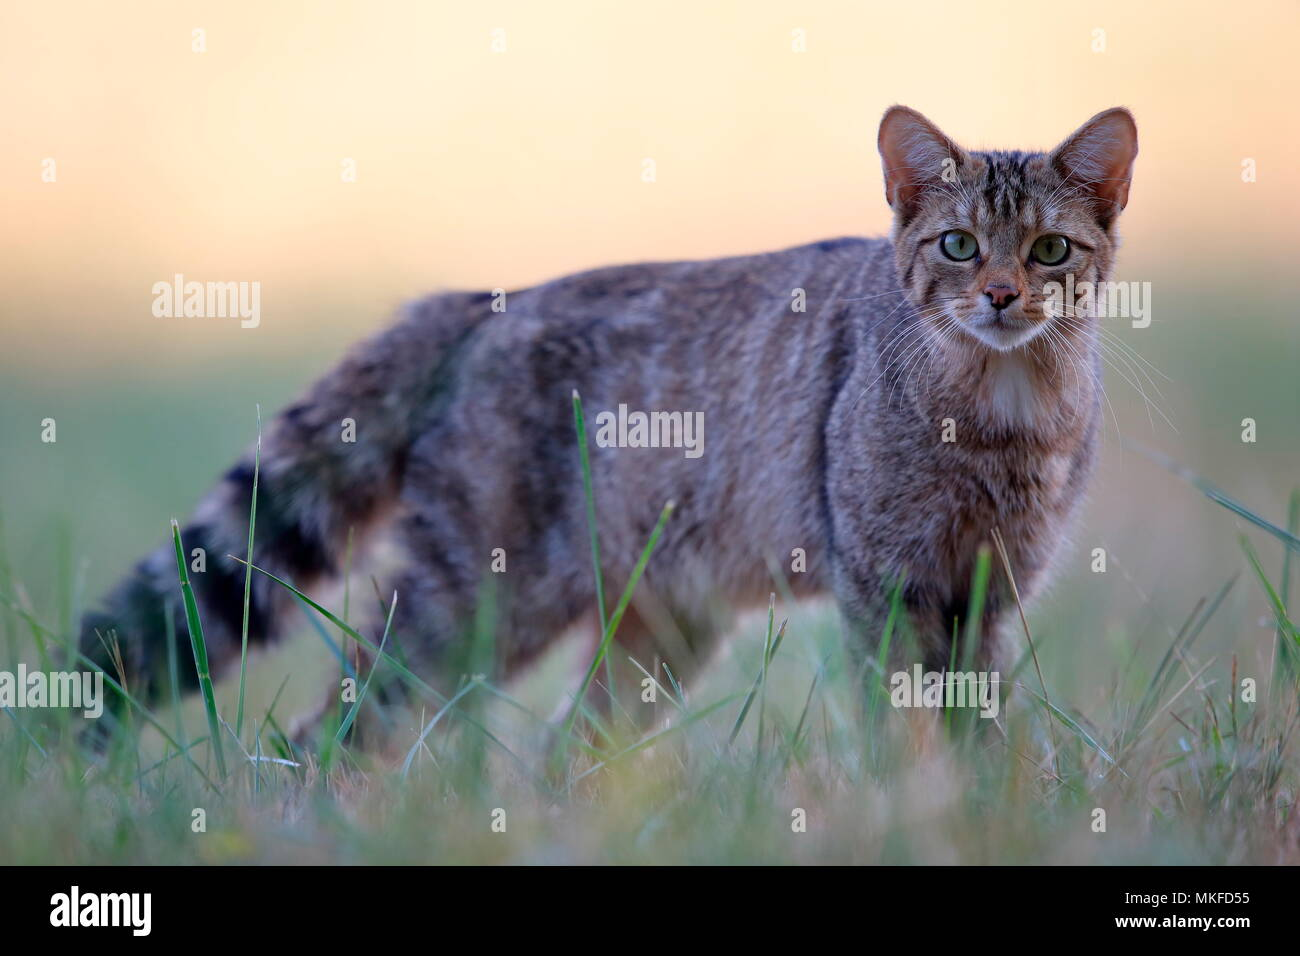 Wild cat (Felis silvestris) in intimidation. Vezelise, Lorraine, France - Stock Image